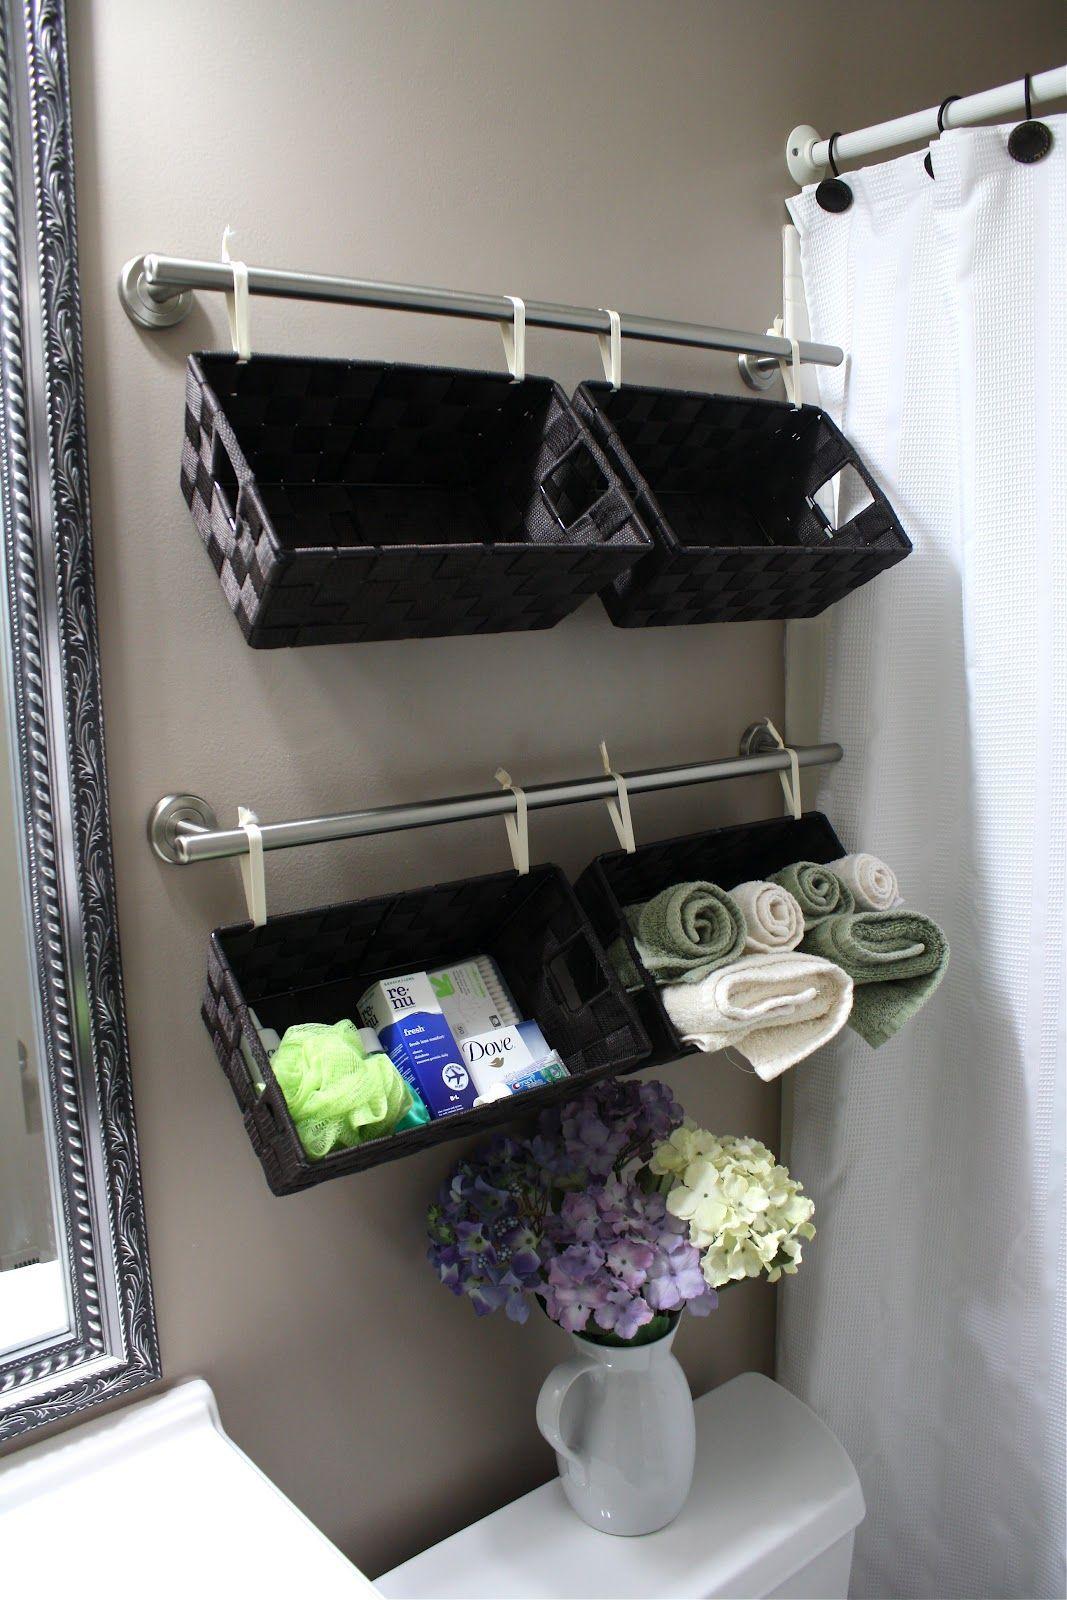 21 Diy Bathroom Organizational Projects That Will Make Your Bathroom Look Awesome Rangement Salle De Bain Idee Rangement Et Rangement Petit Espace